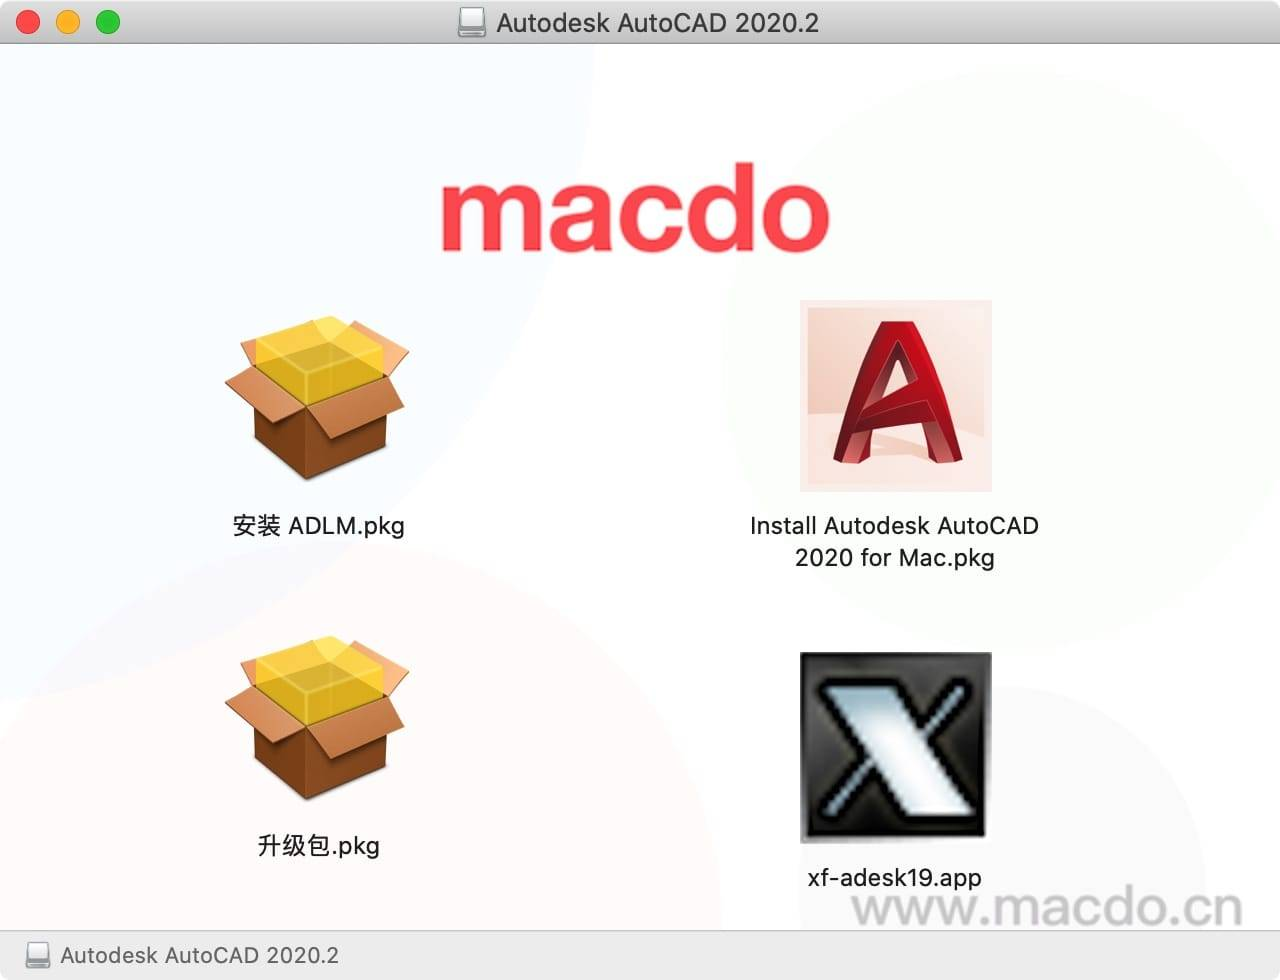 AutoCAD 2020.2 for Mac  英文版破解教程 Mac教程 第1张